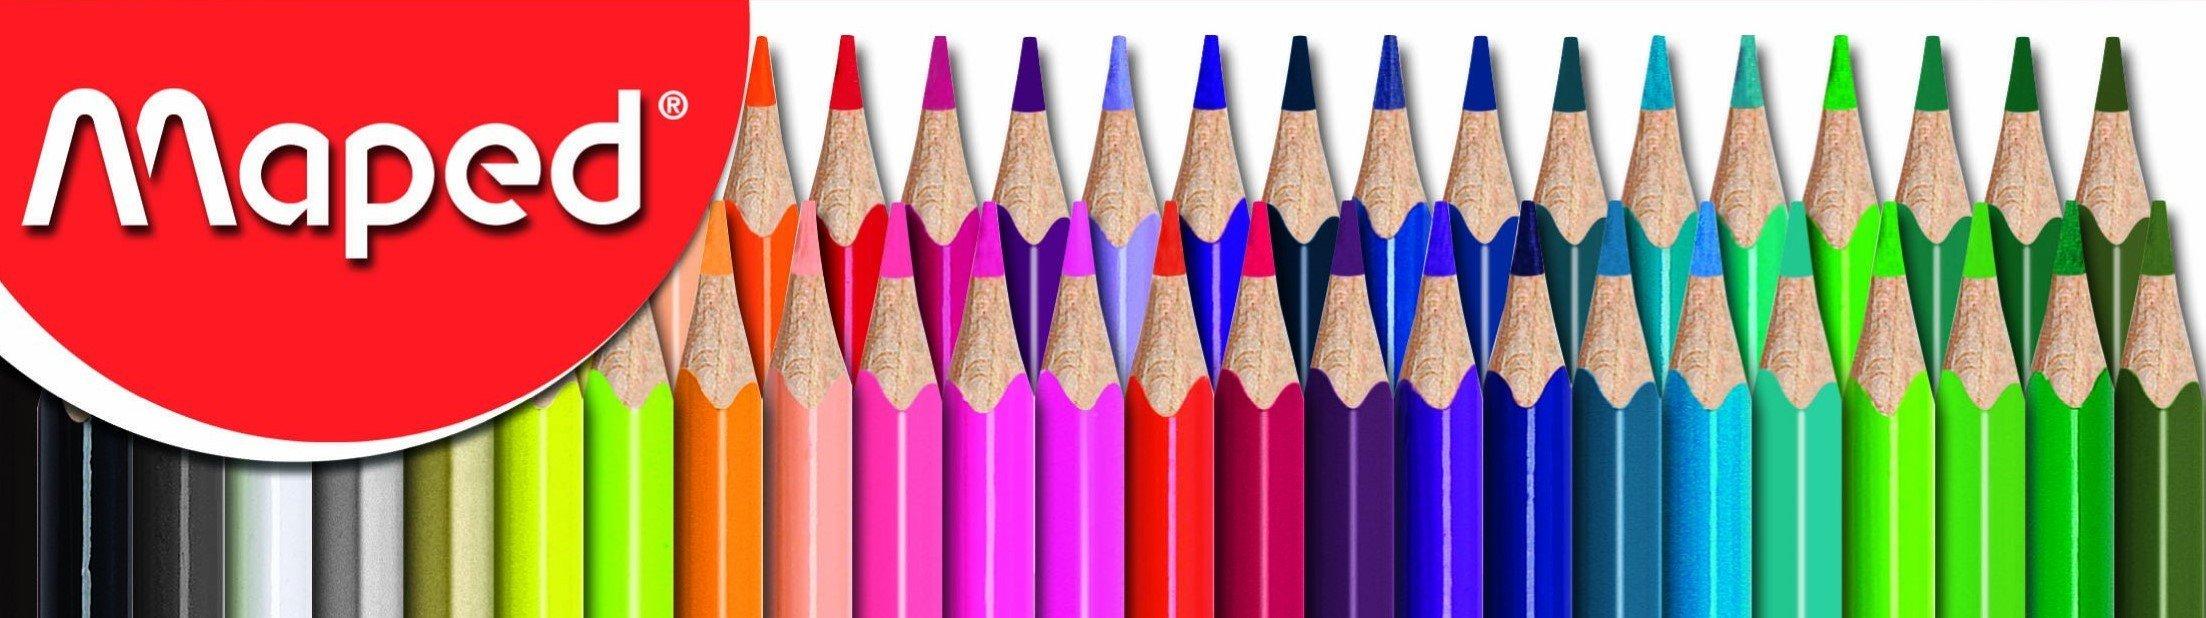 Maped Kırmızı Kutu kurboya kalemi